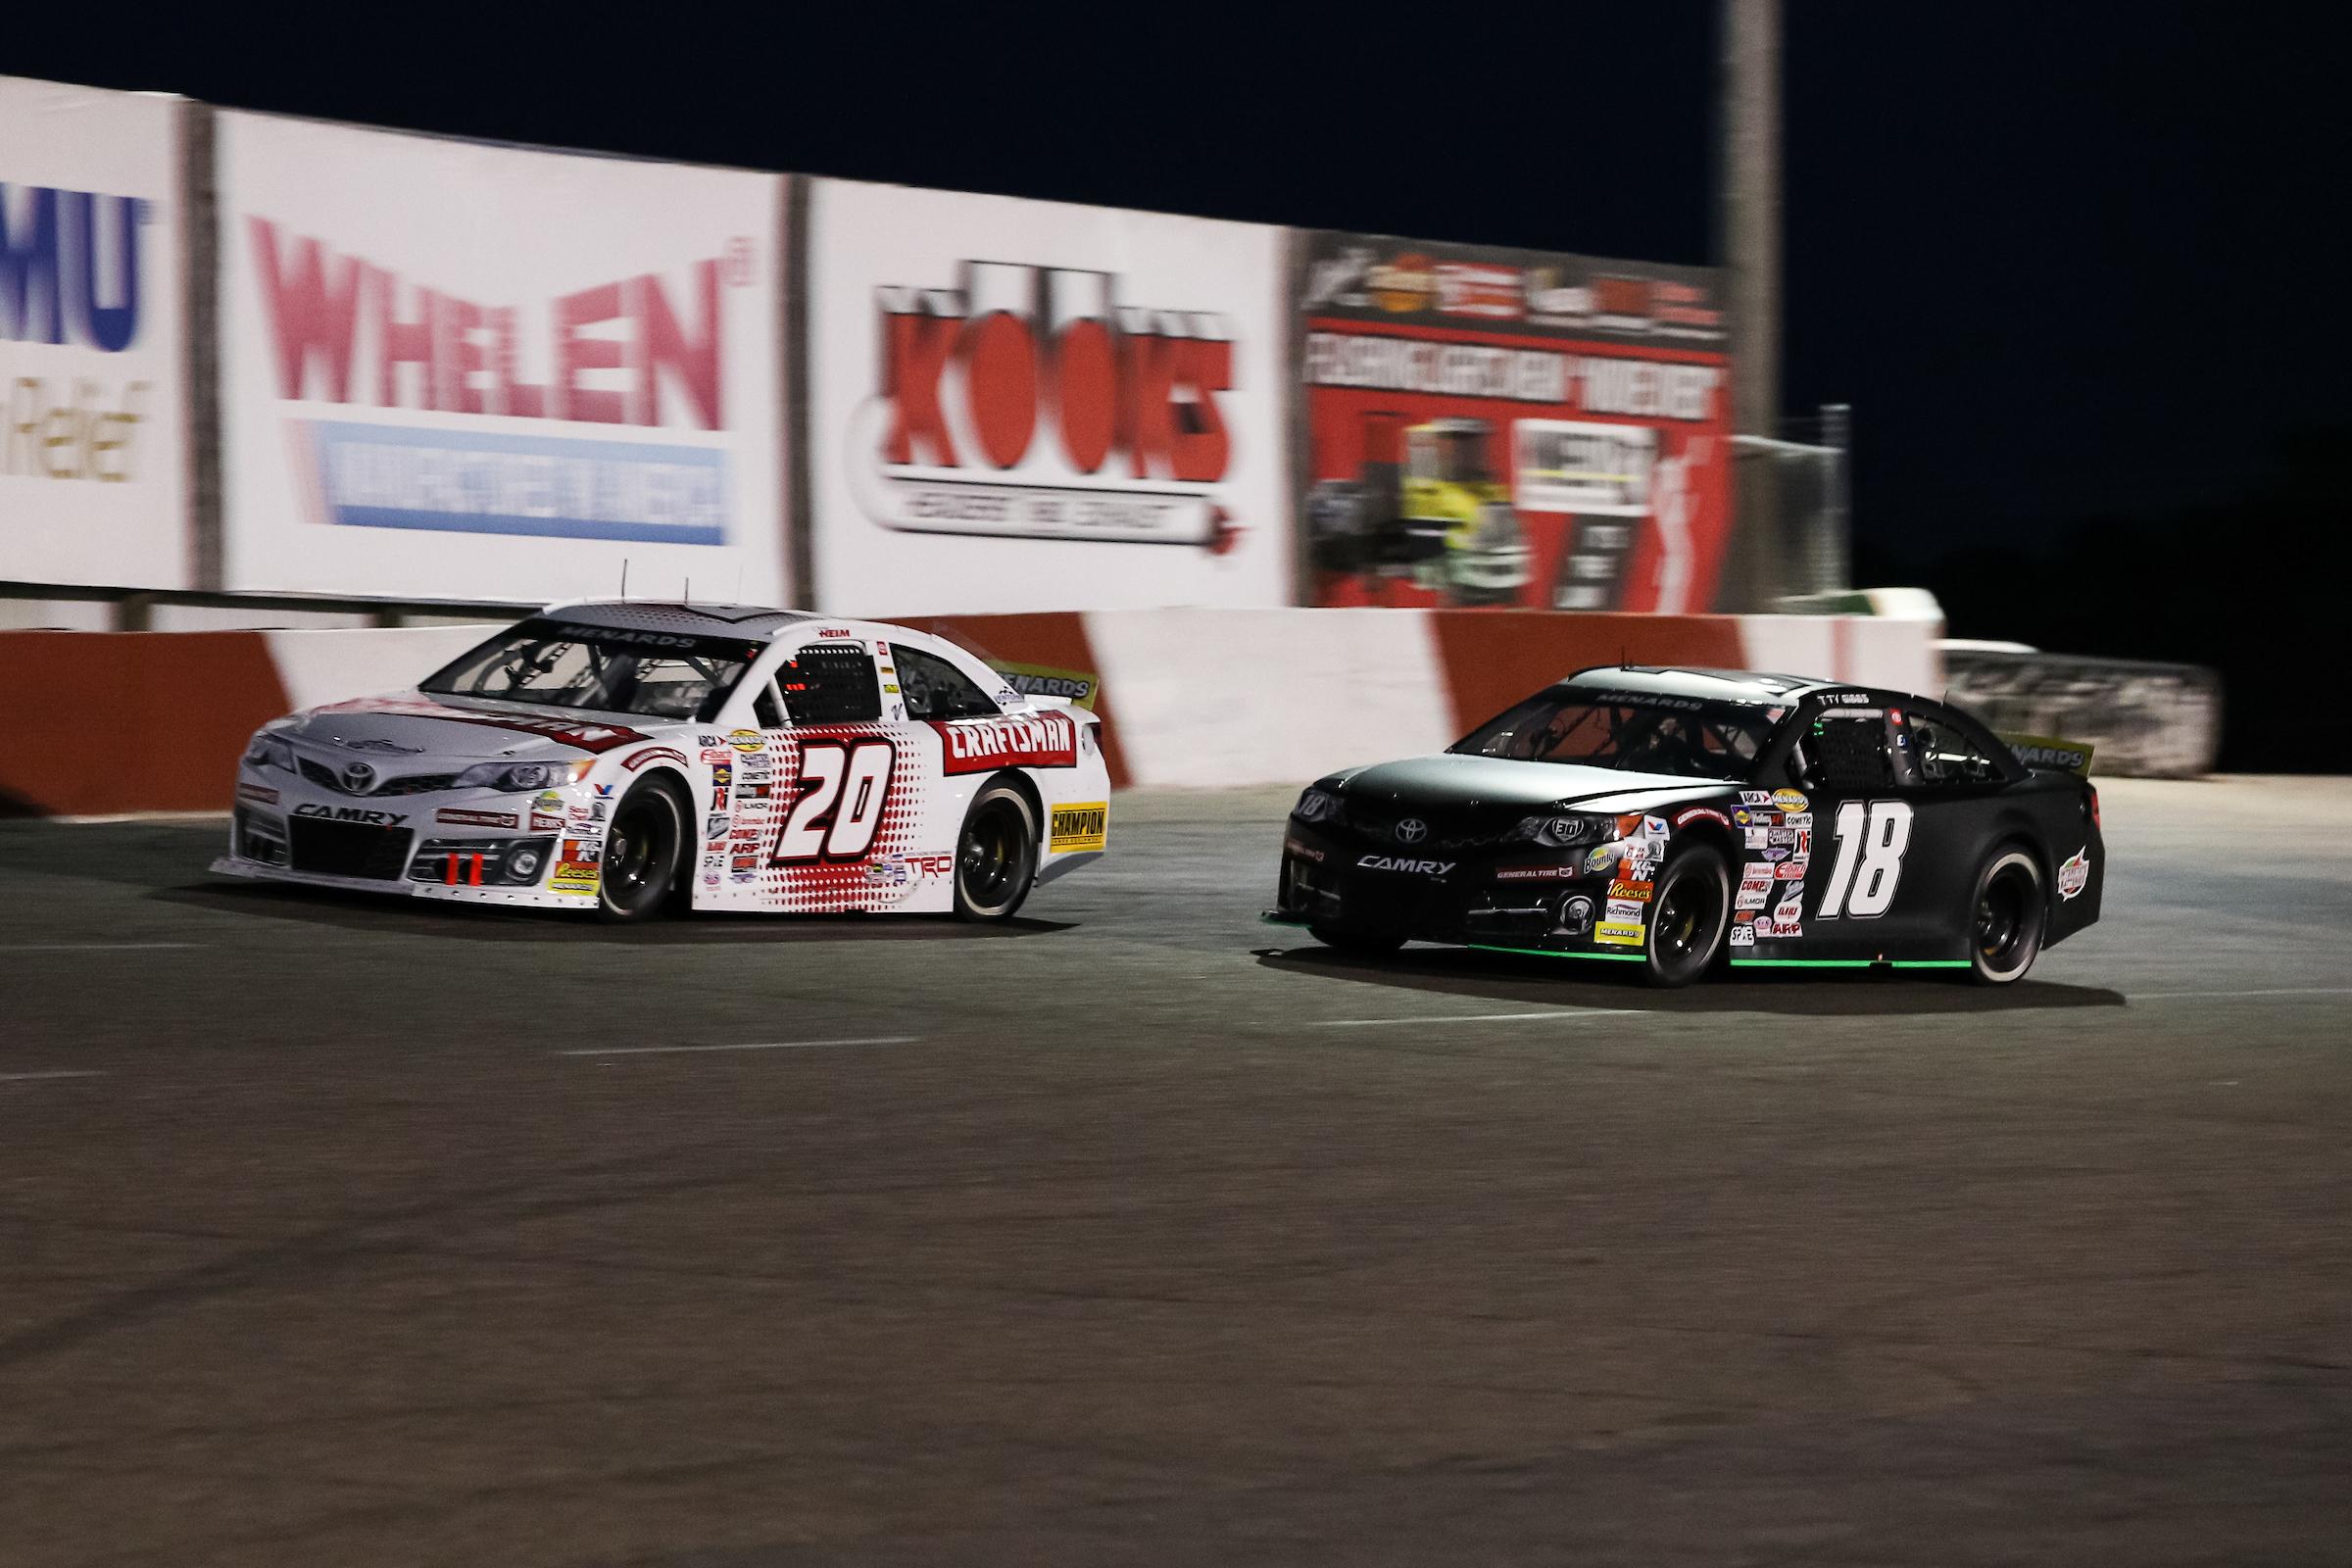 Menards 250 for the ARCA Menards Series at Elko Speedway